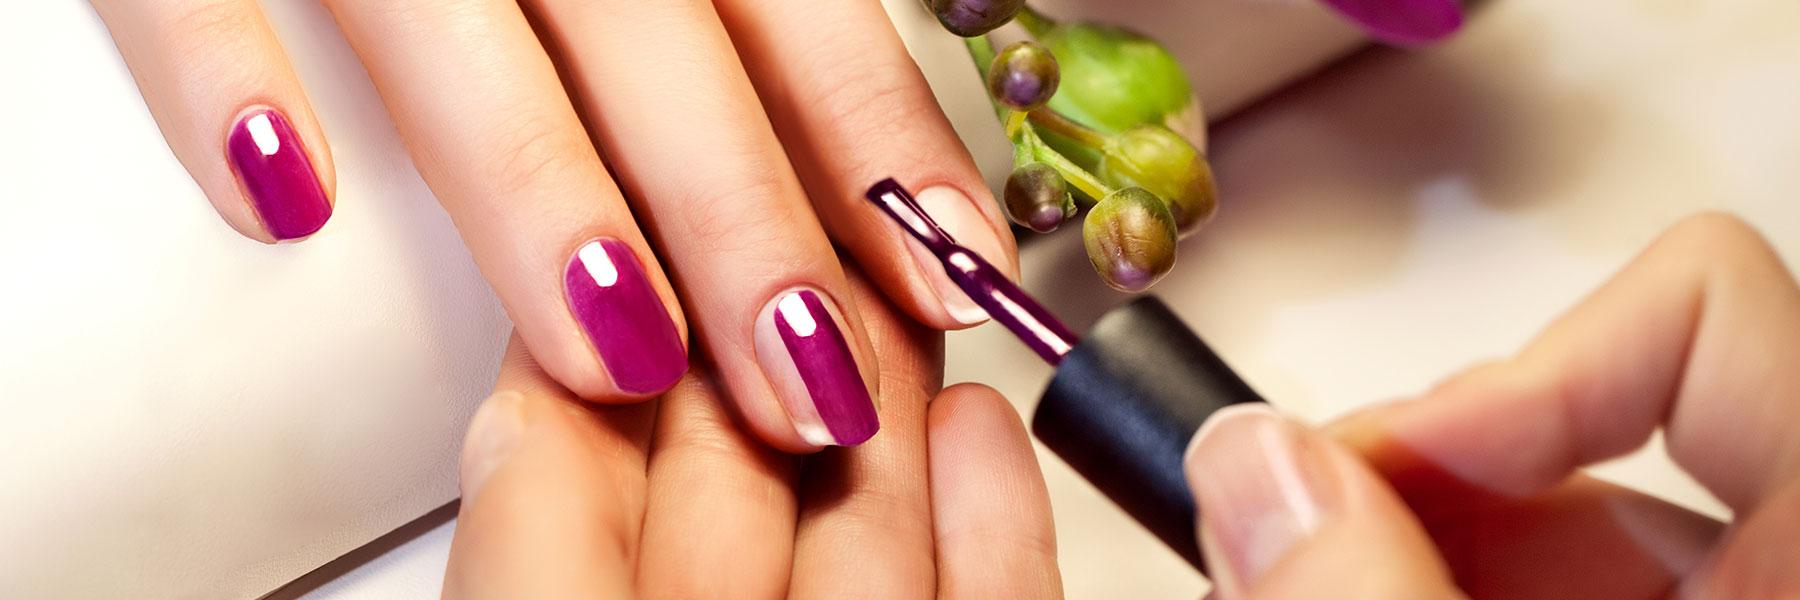 sedalia nail services